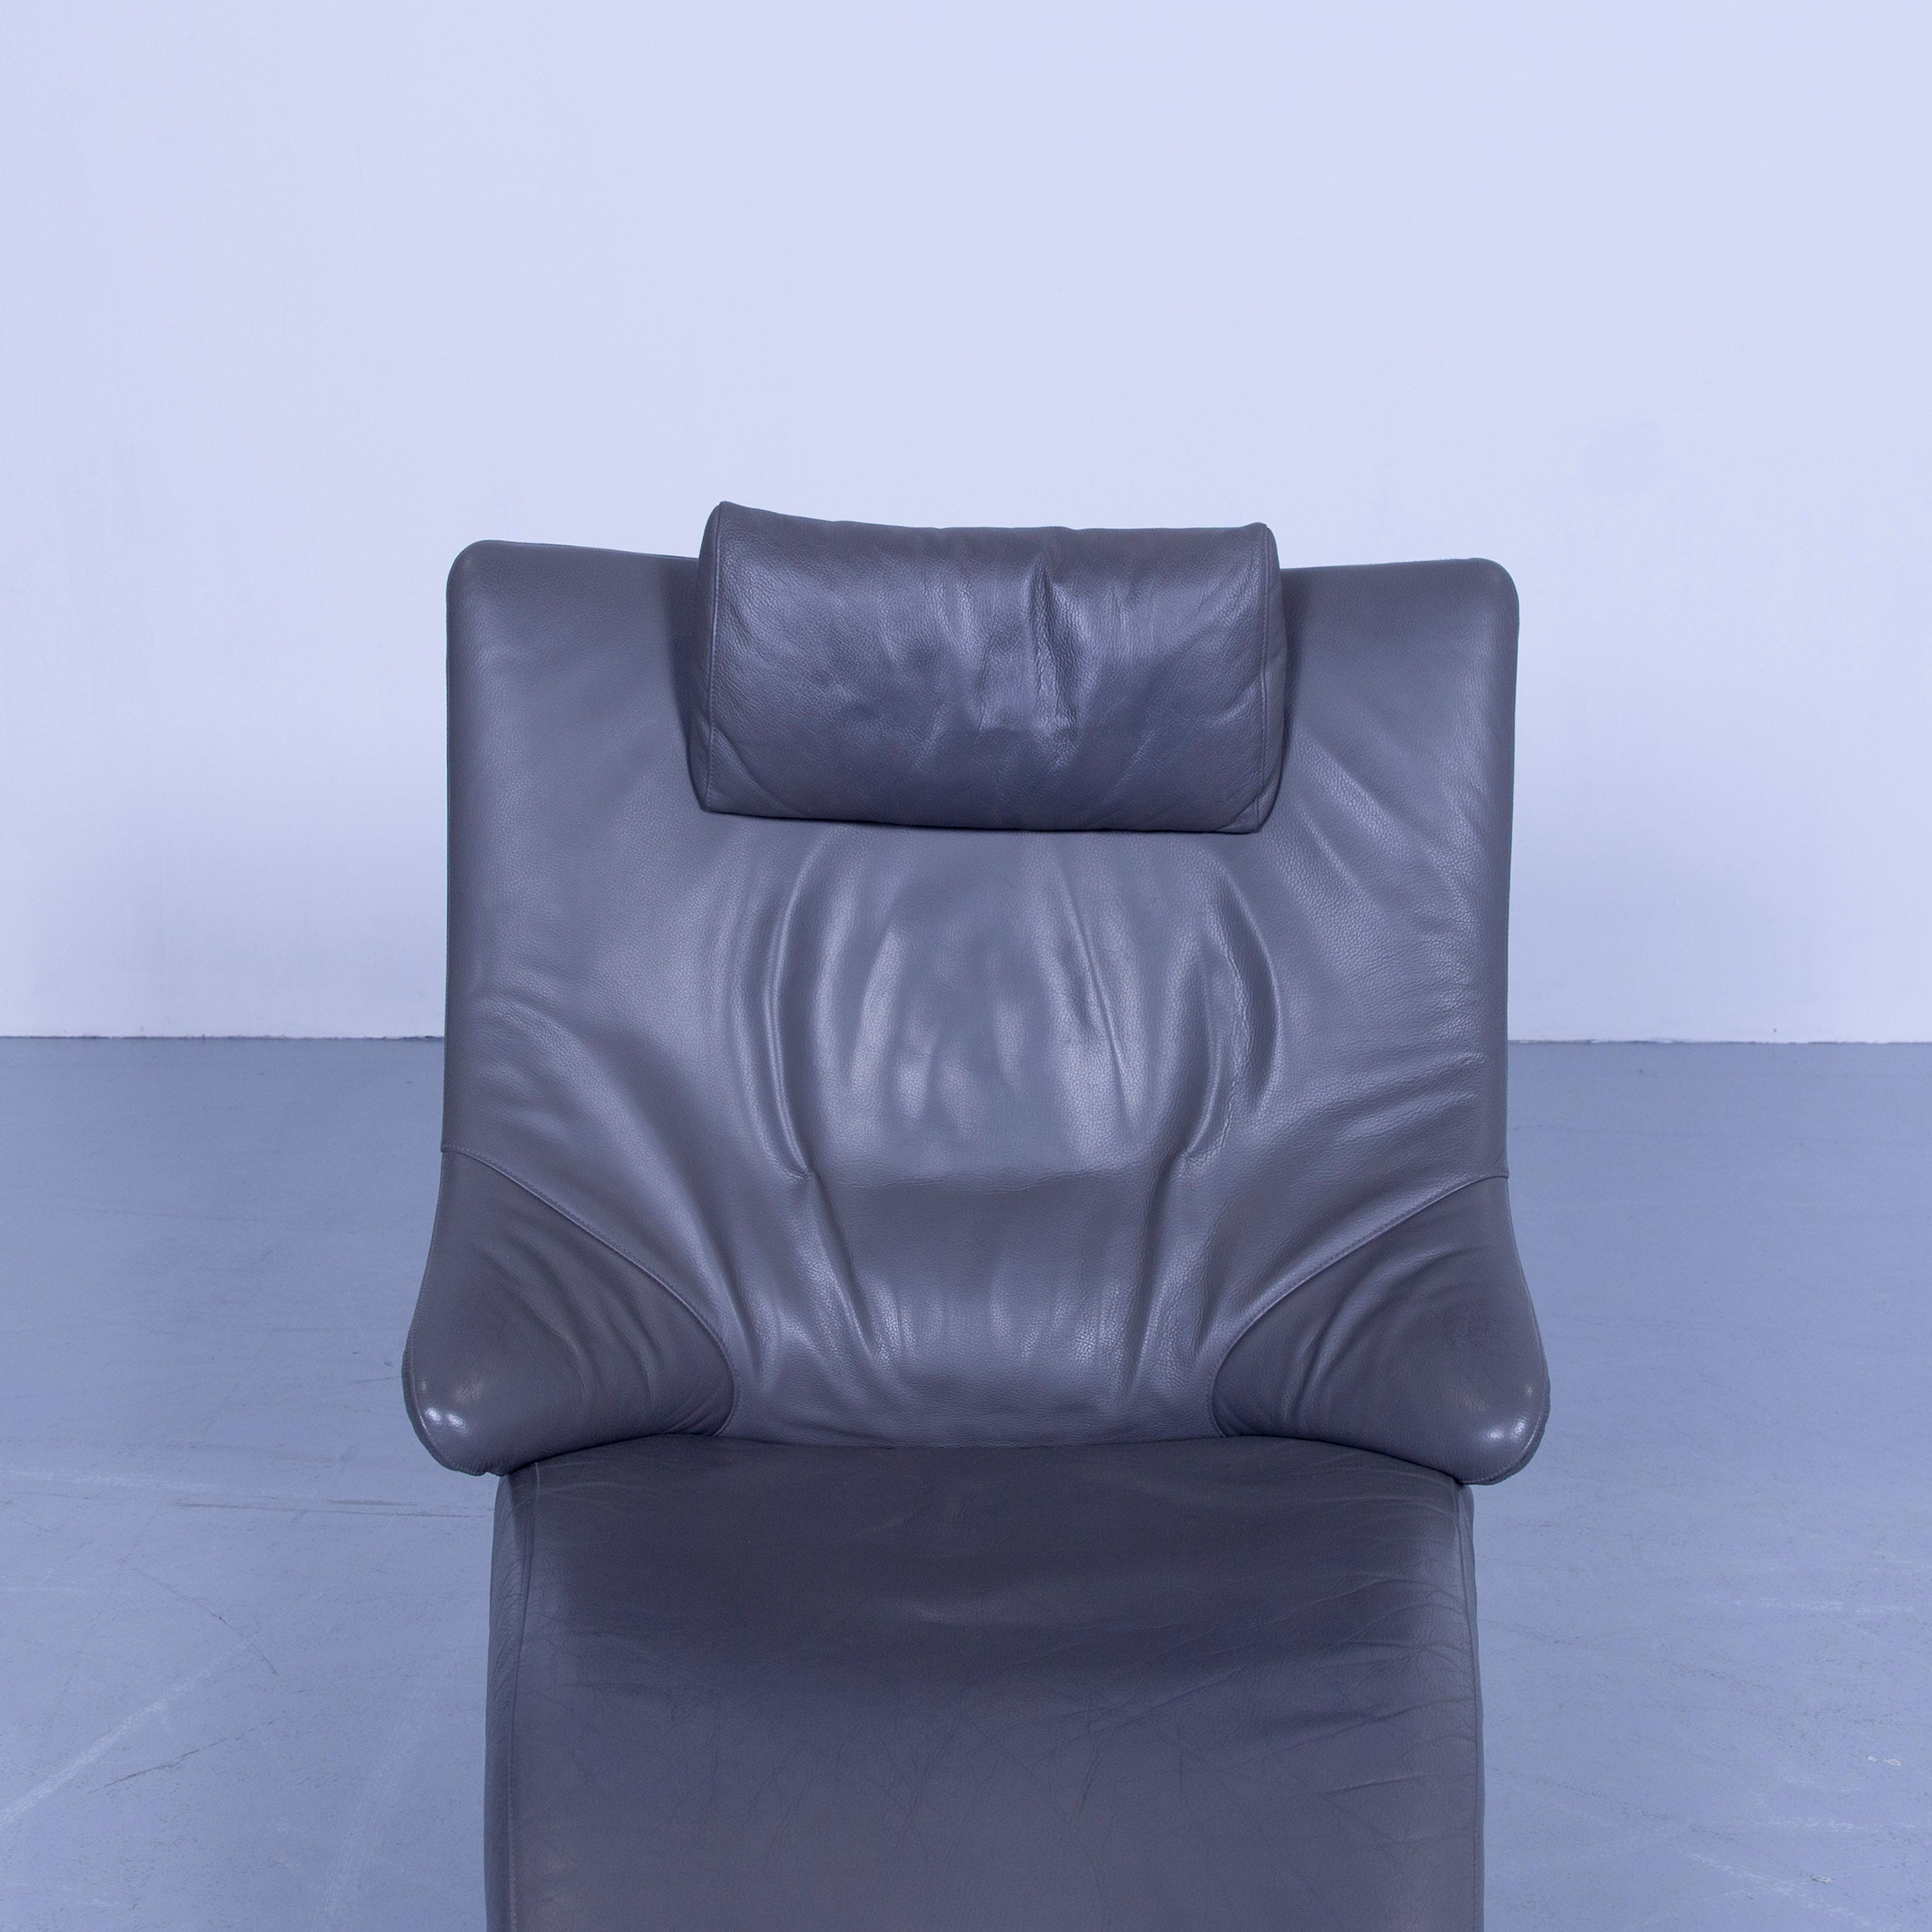 WK Wohnen Solo 699 Designer Chair Leather Grey Function Couch Modern ...